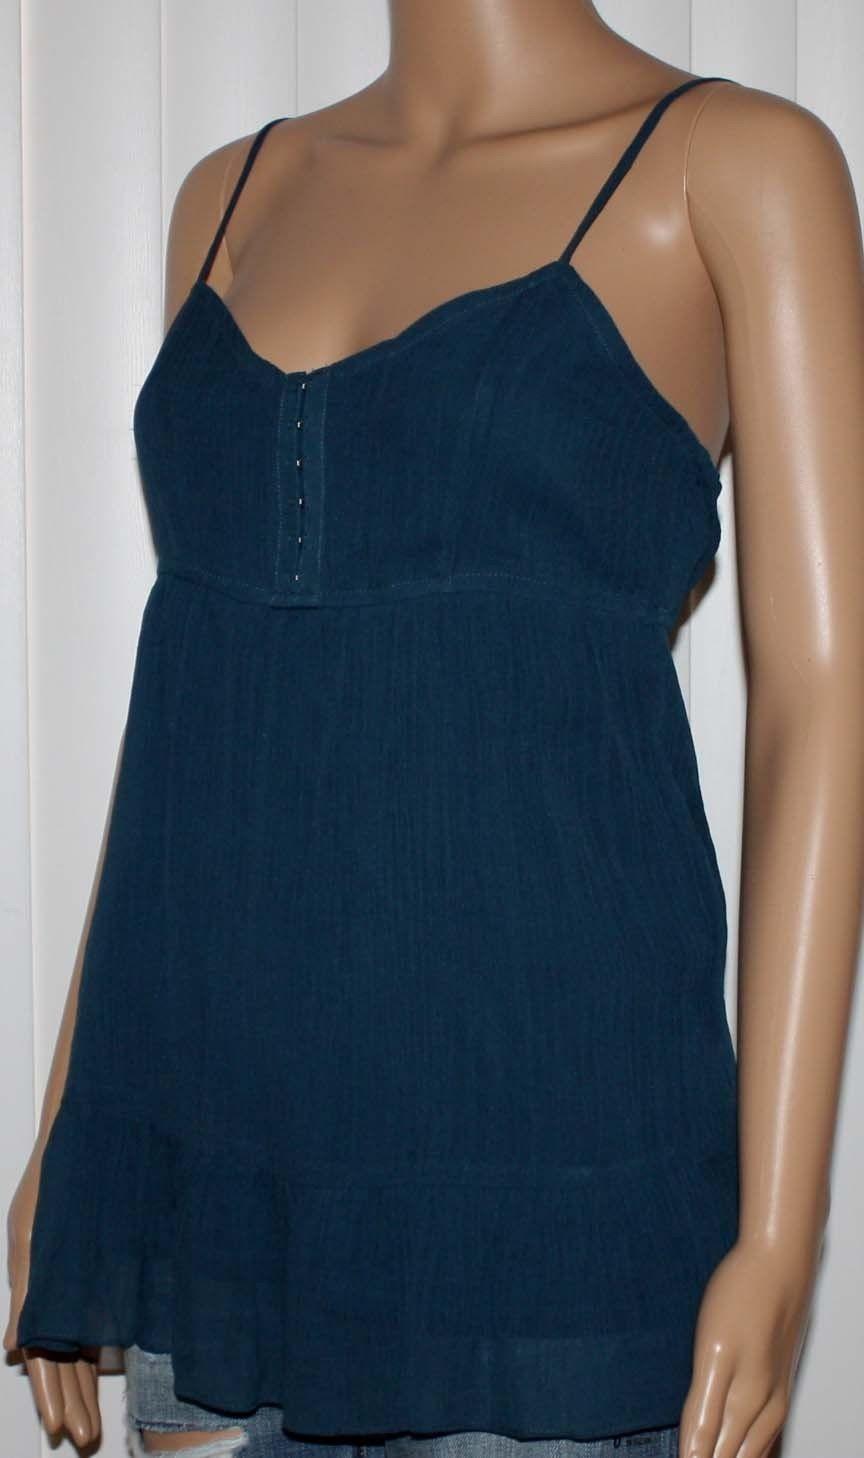 American Eagle Women's Slate Blue Crepe Cami Top (Small)